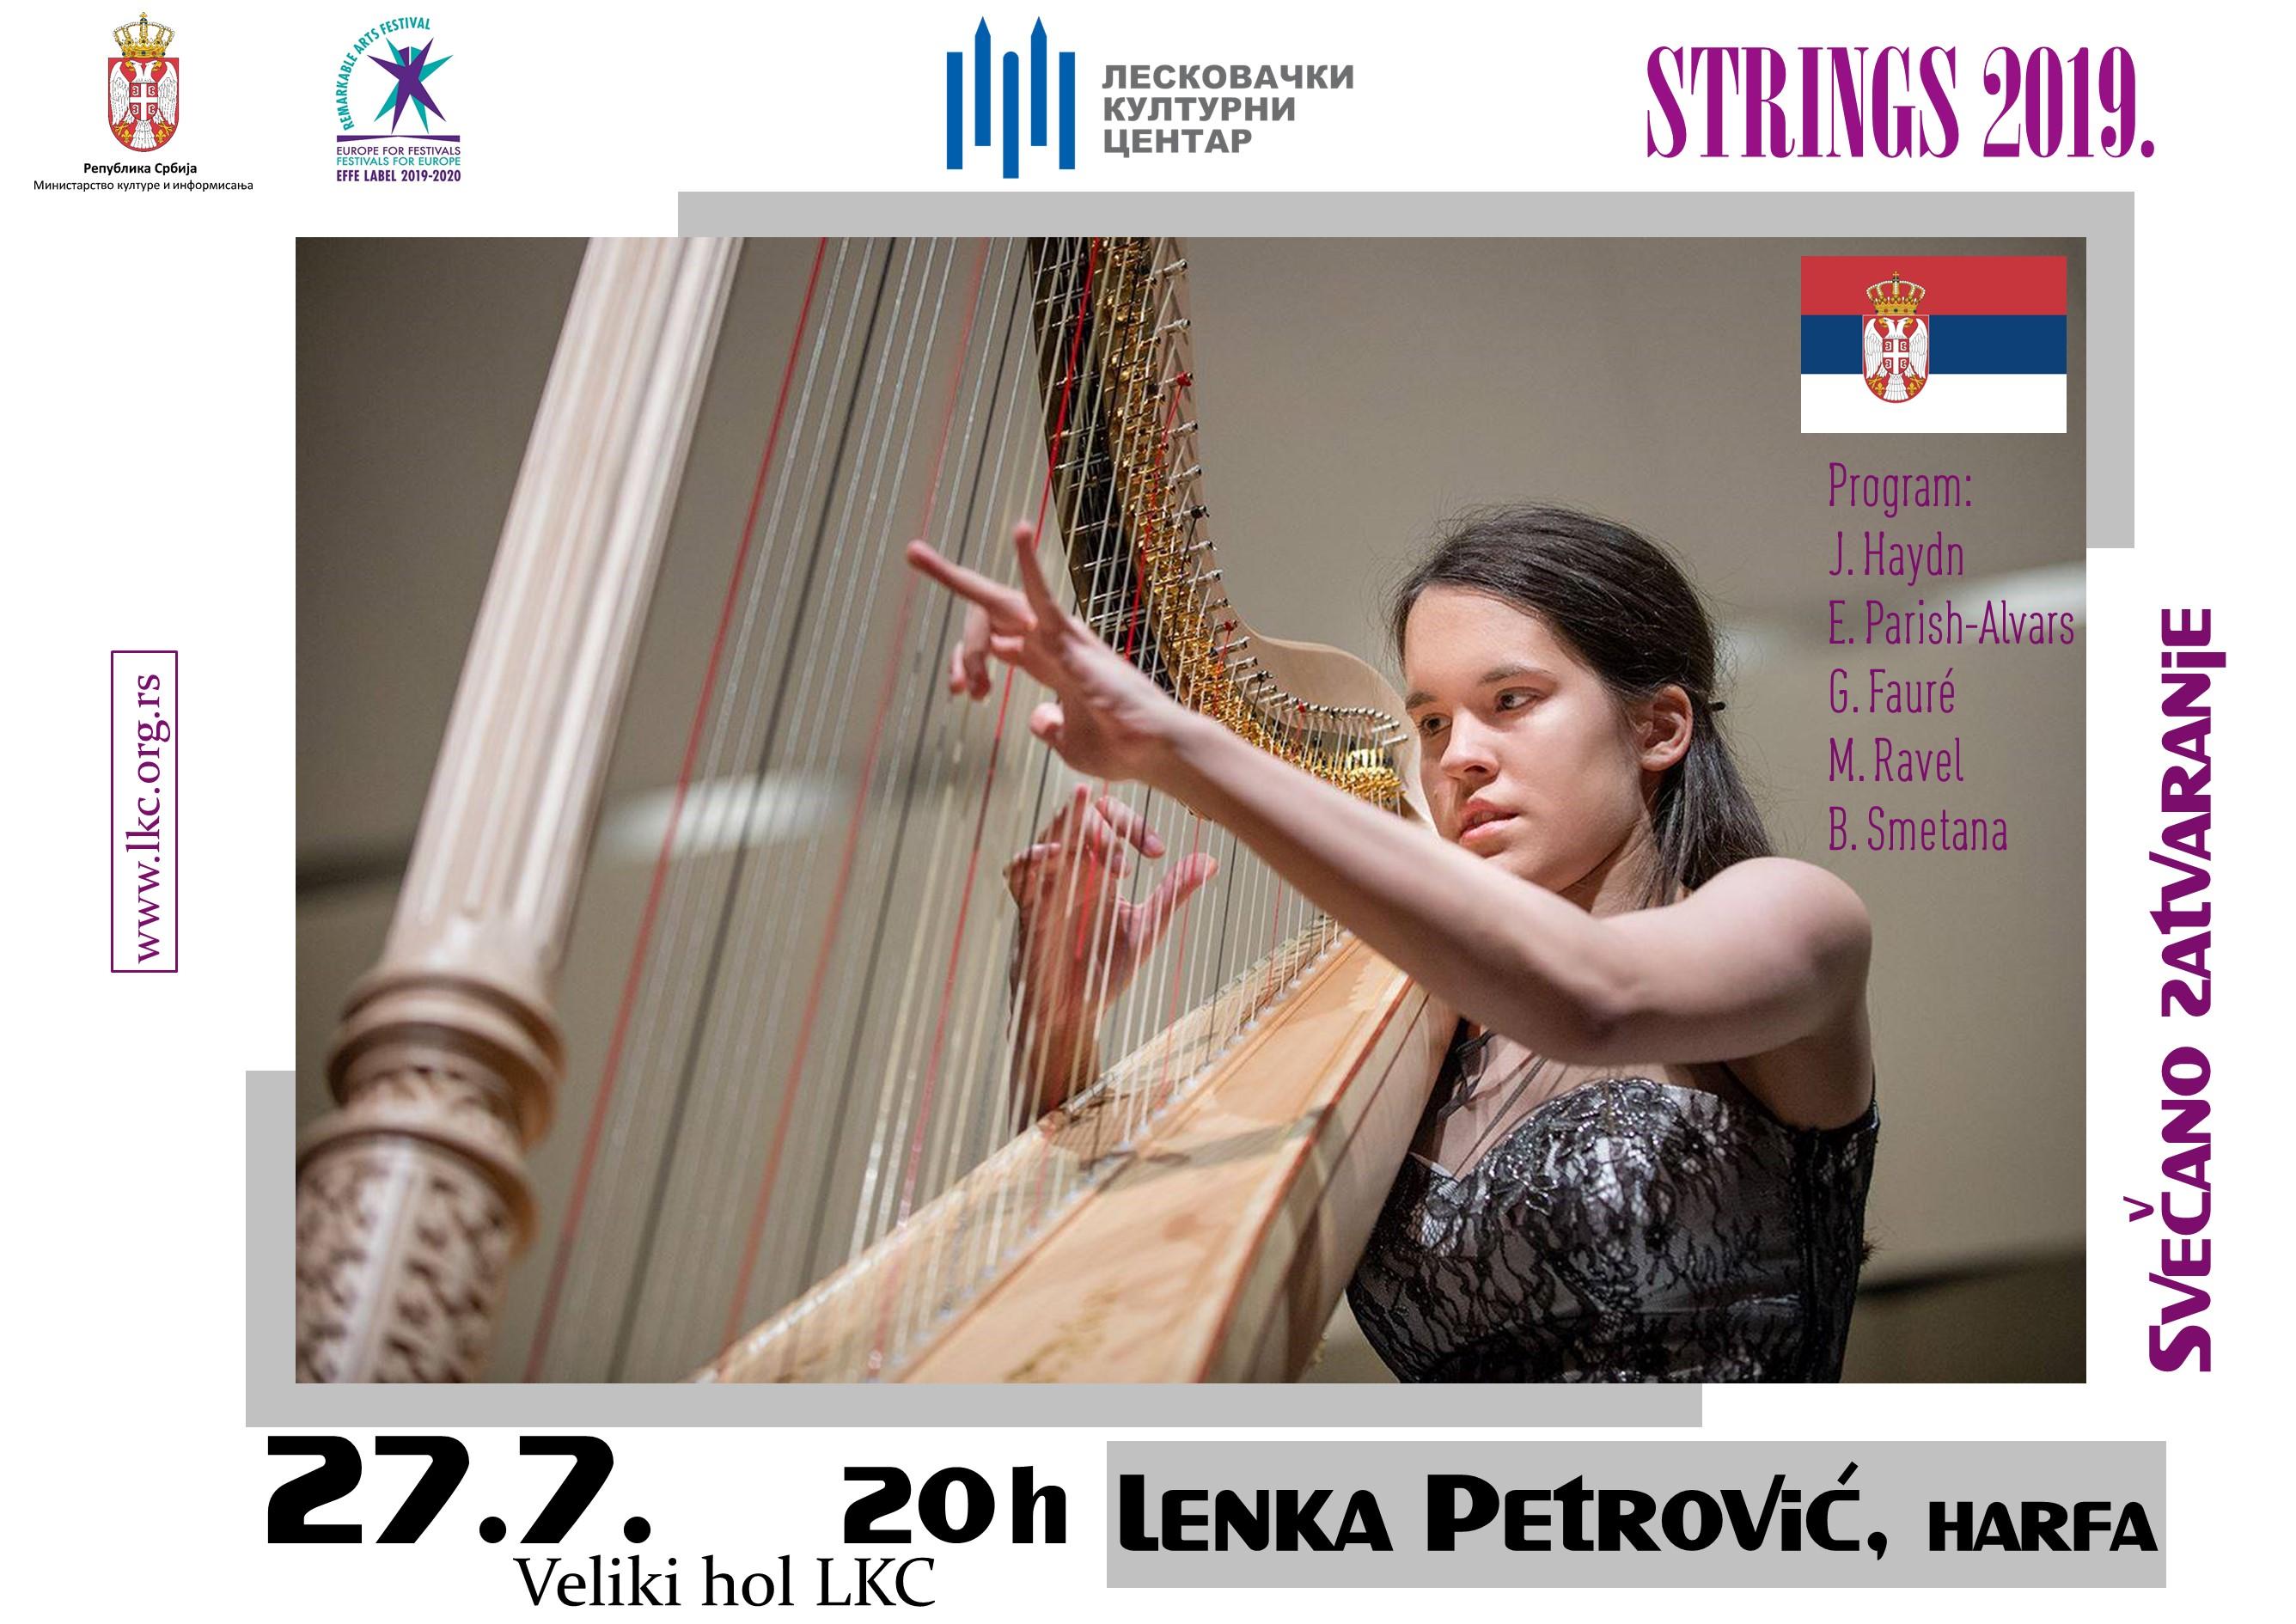 15. Lenka Petrovic, harfa B2-1